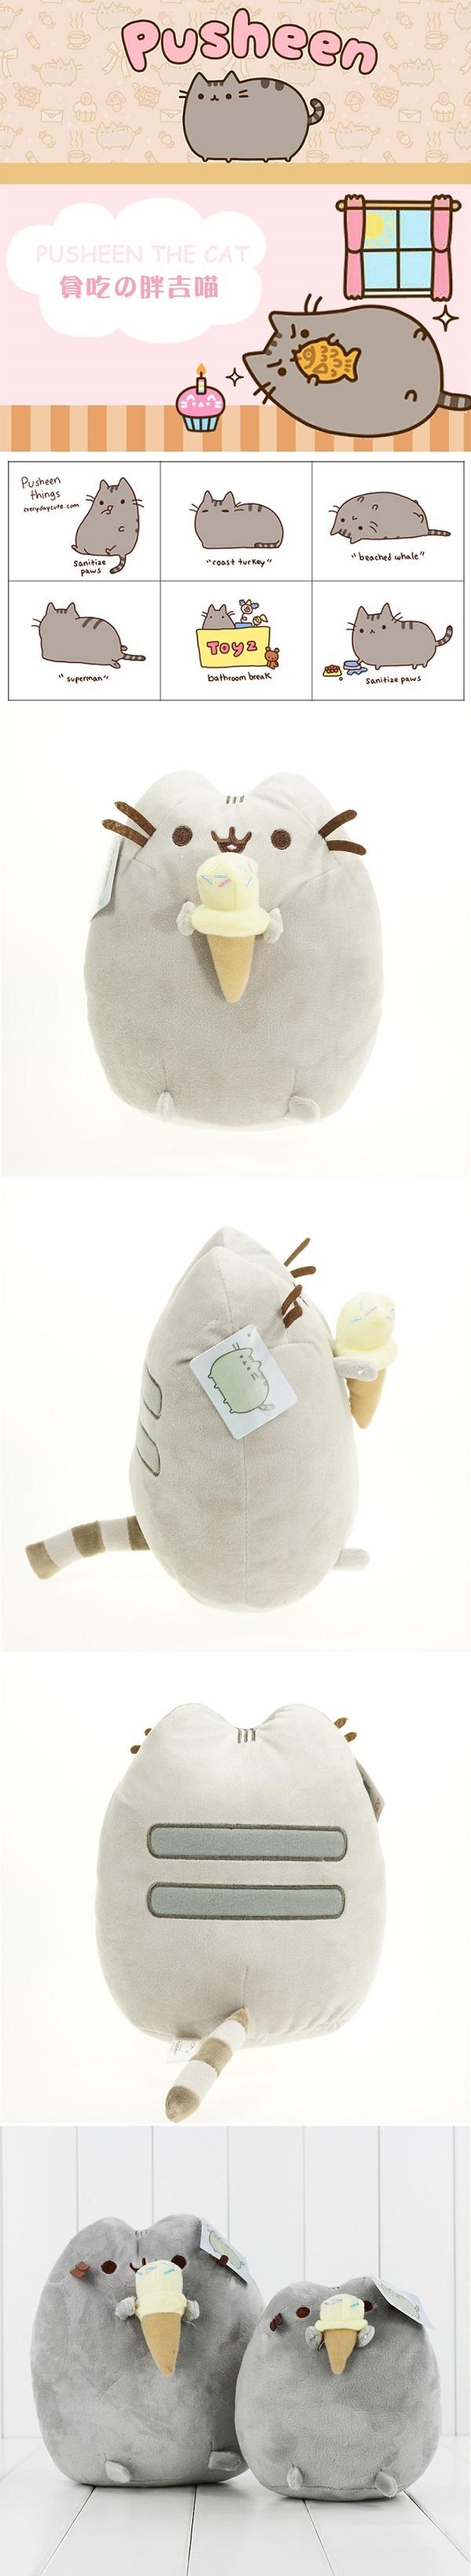 Pusheen Cat With Ice Cream